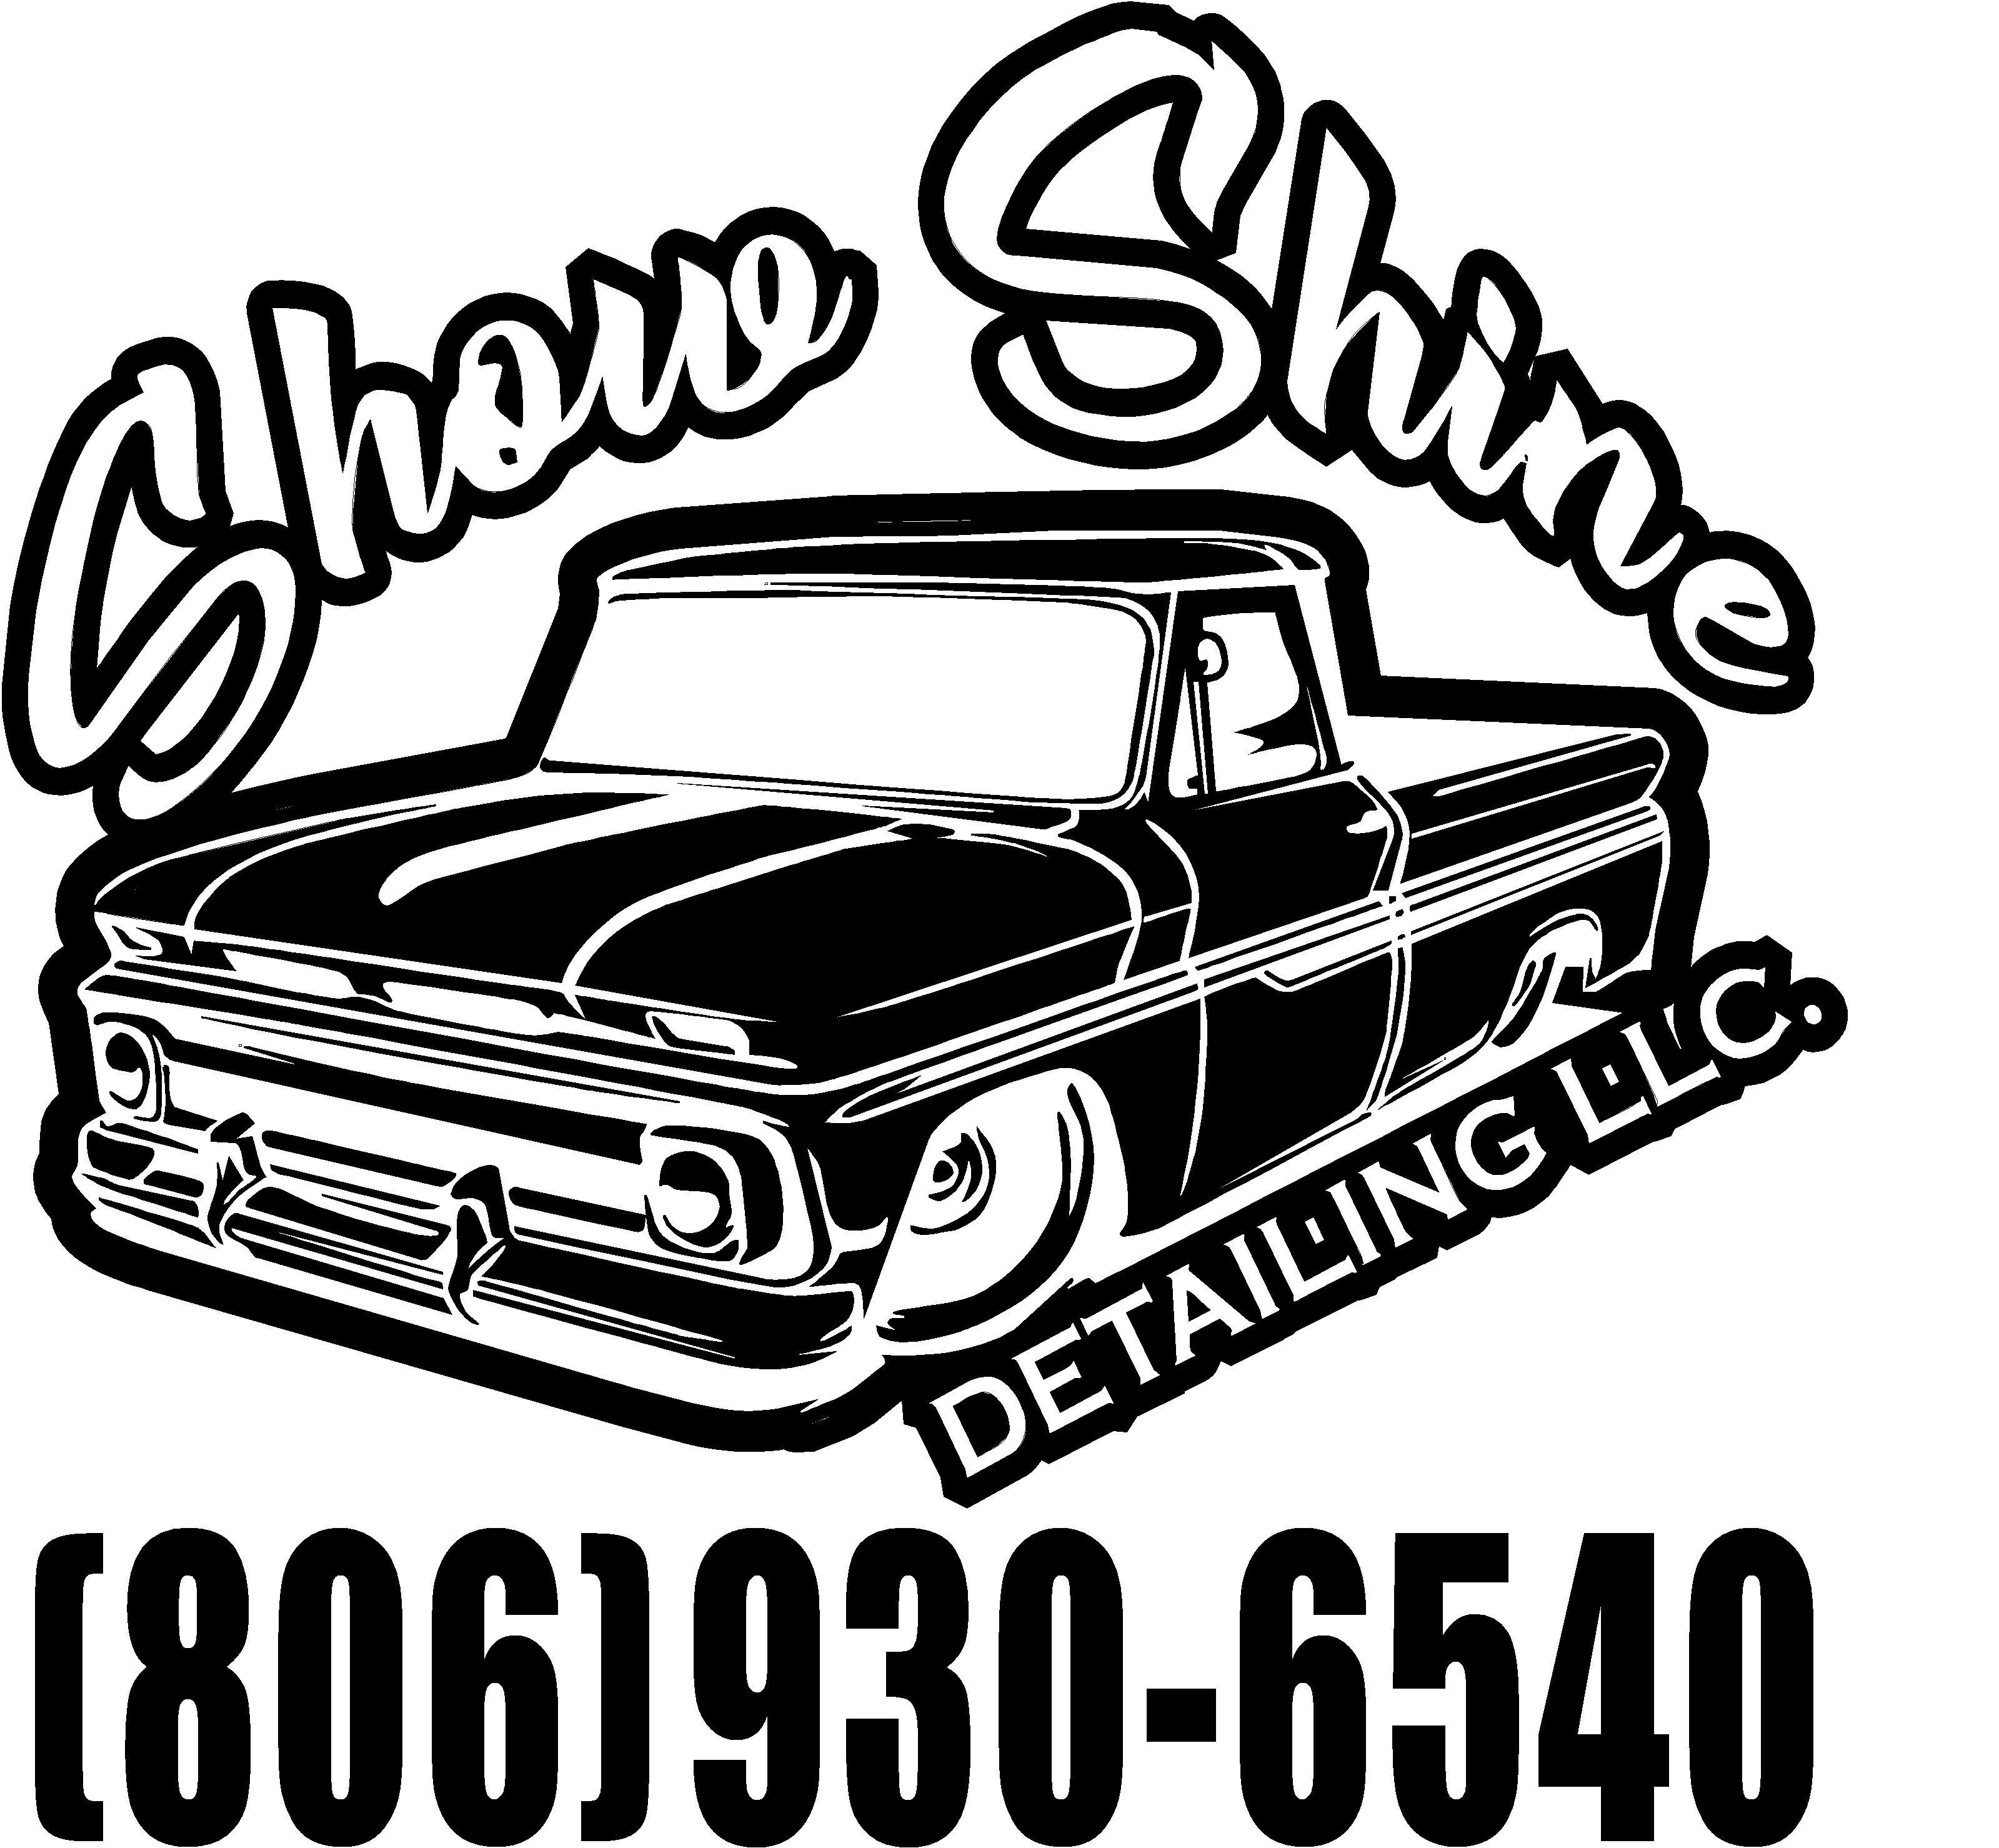 Show Shine Detailing LLC